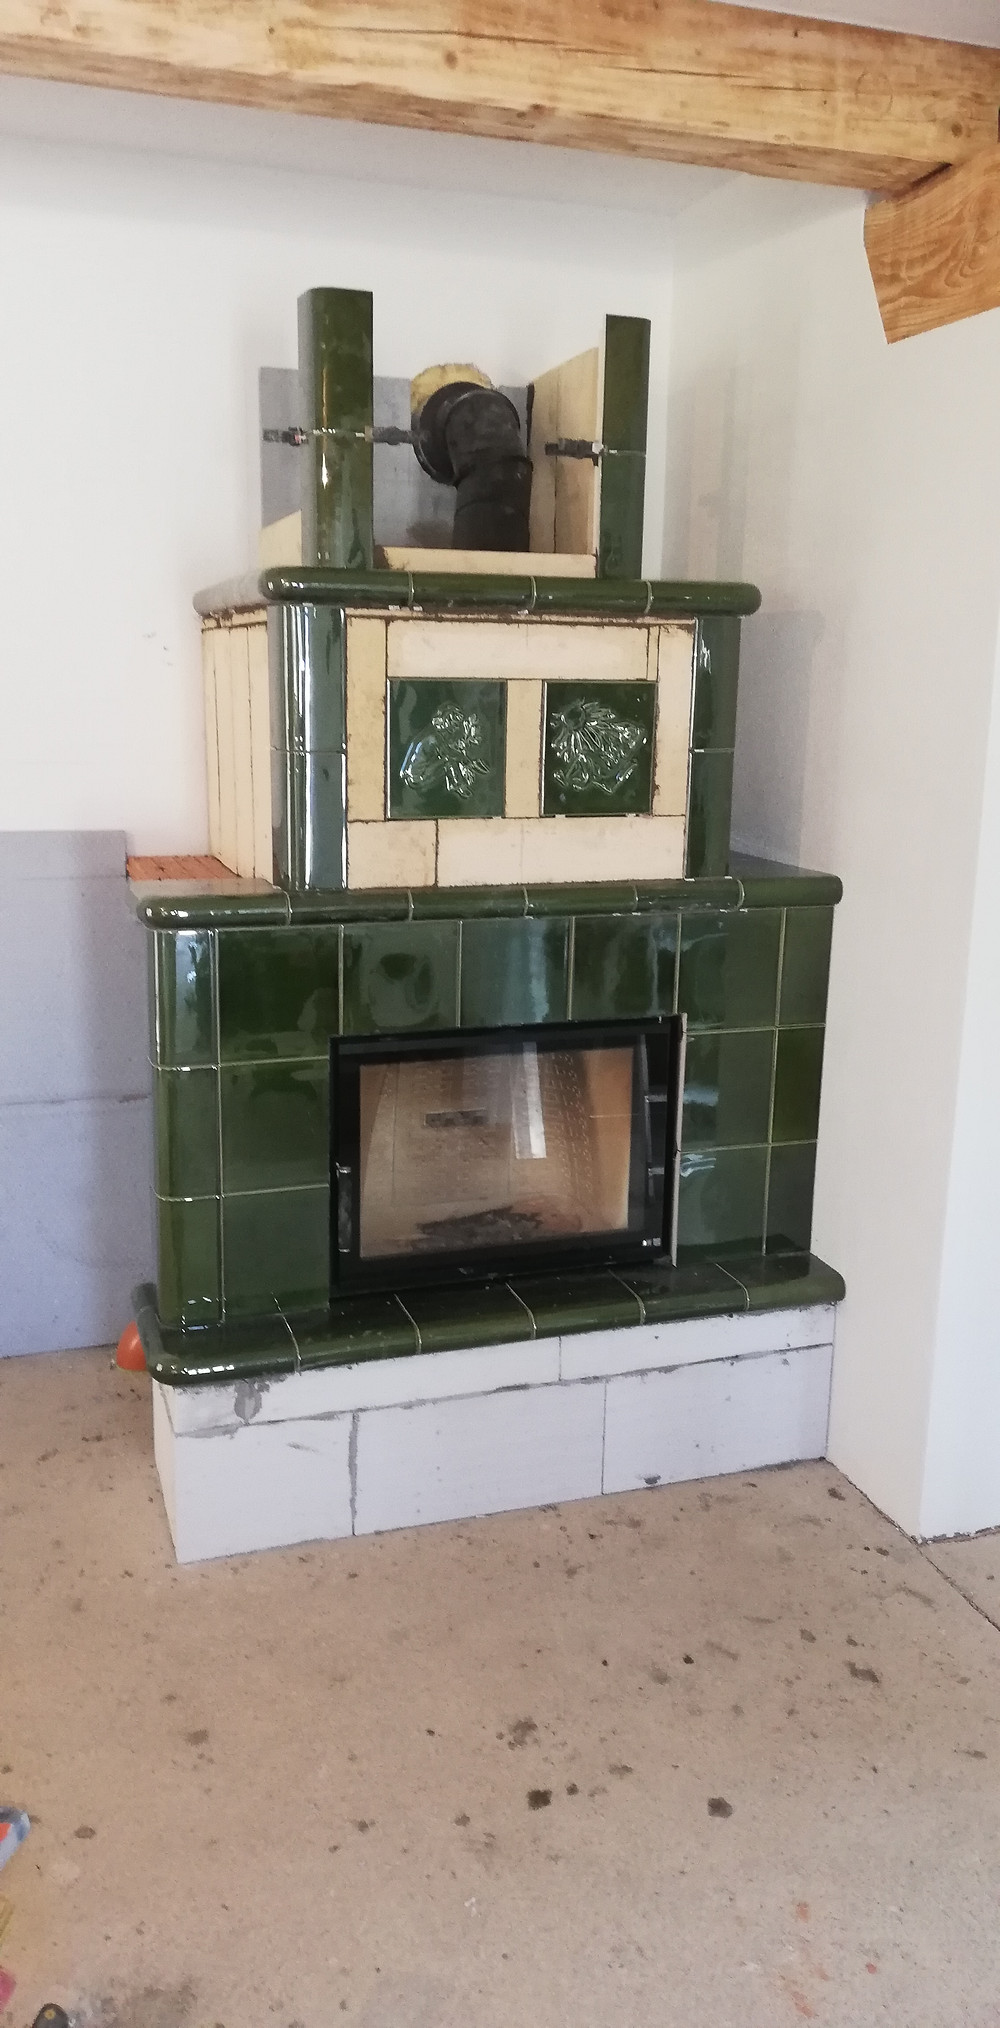 tradicna kachlova pec, stavba kachloveh pece, zelena pec